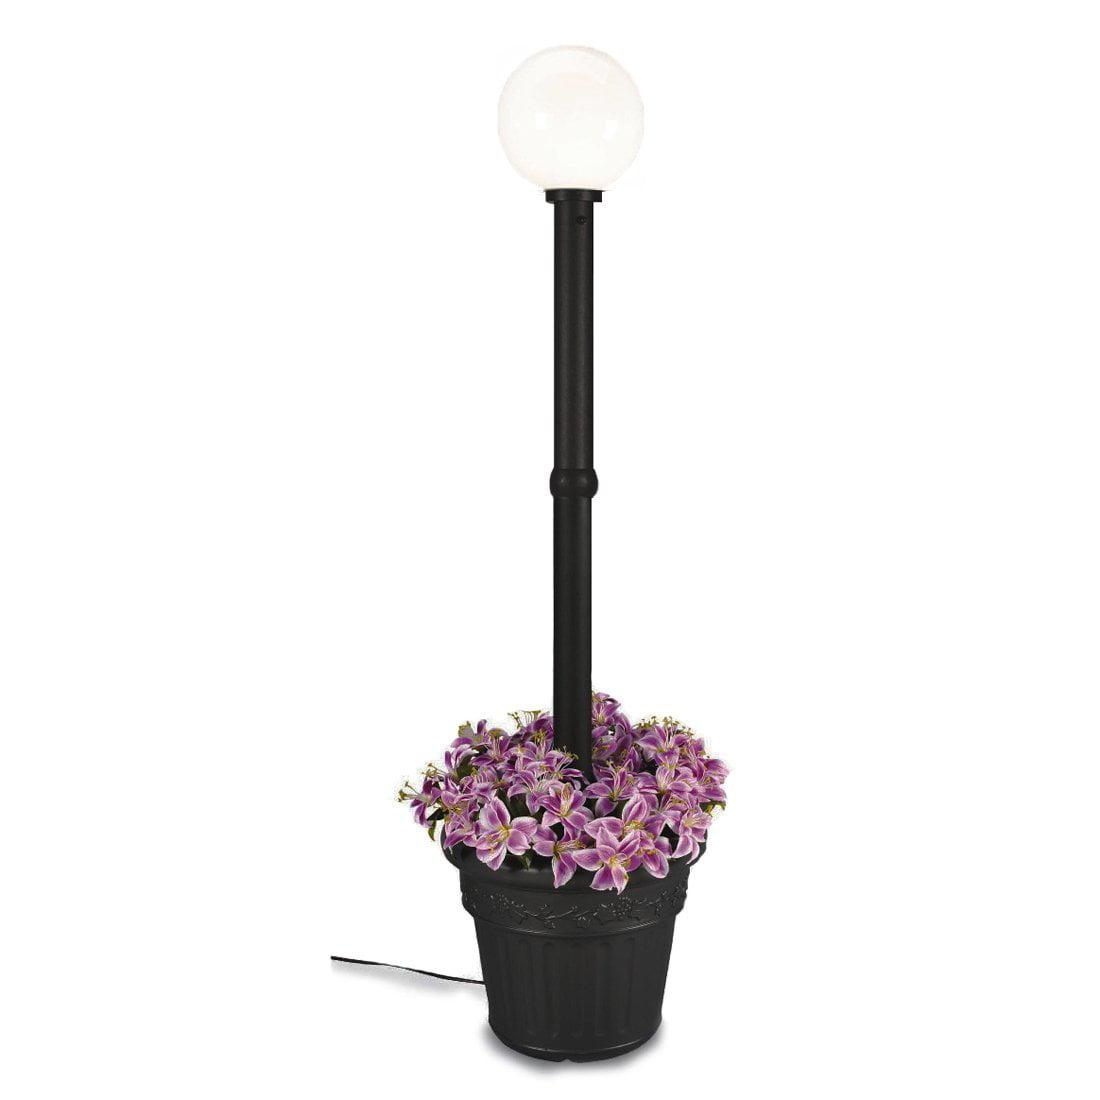 Patio Living Concepts Milano 82 Inch Black w/ White Globe Lantern Planter